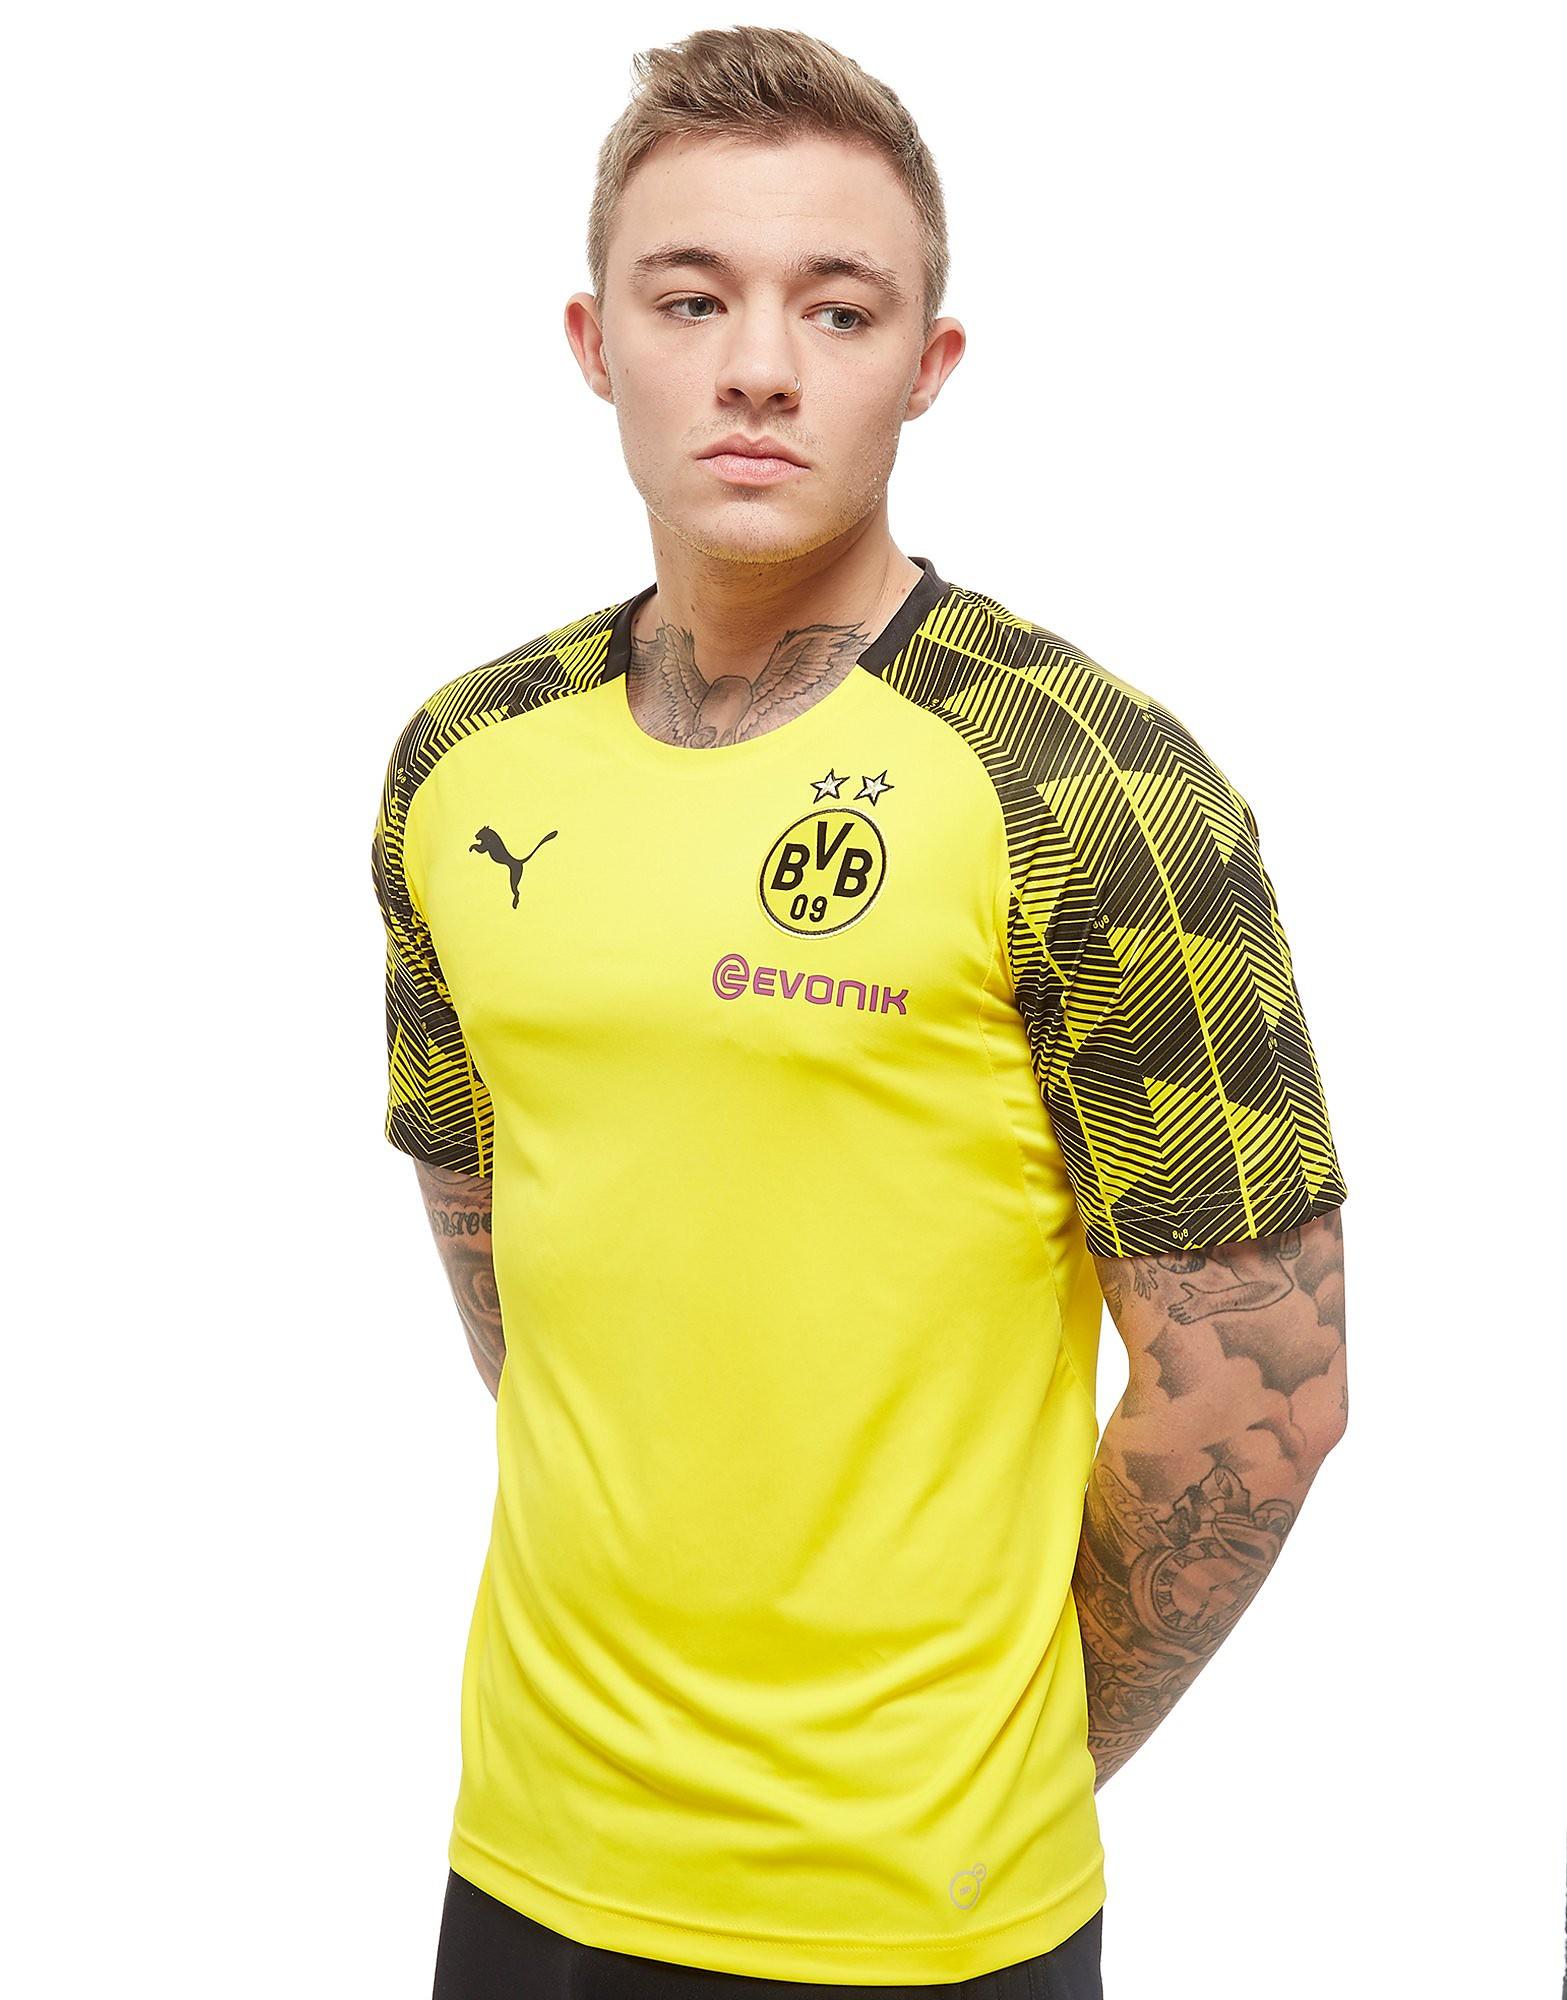 PUMA Borussia Dortmund 2018 Stadium Jersey